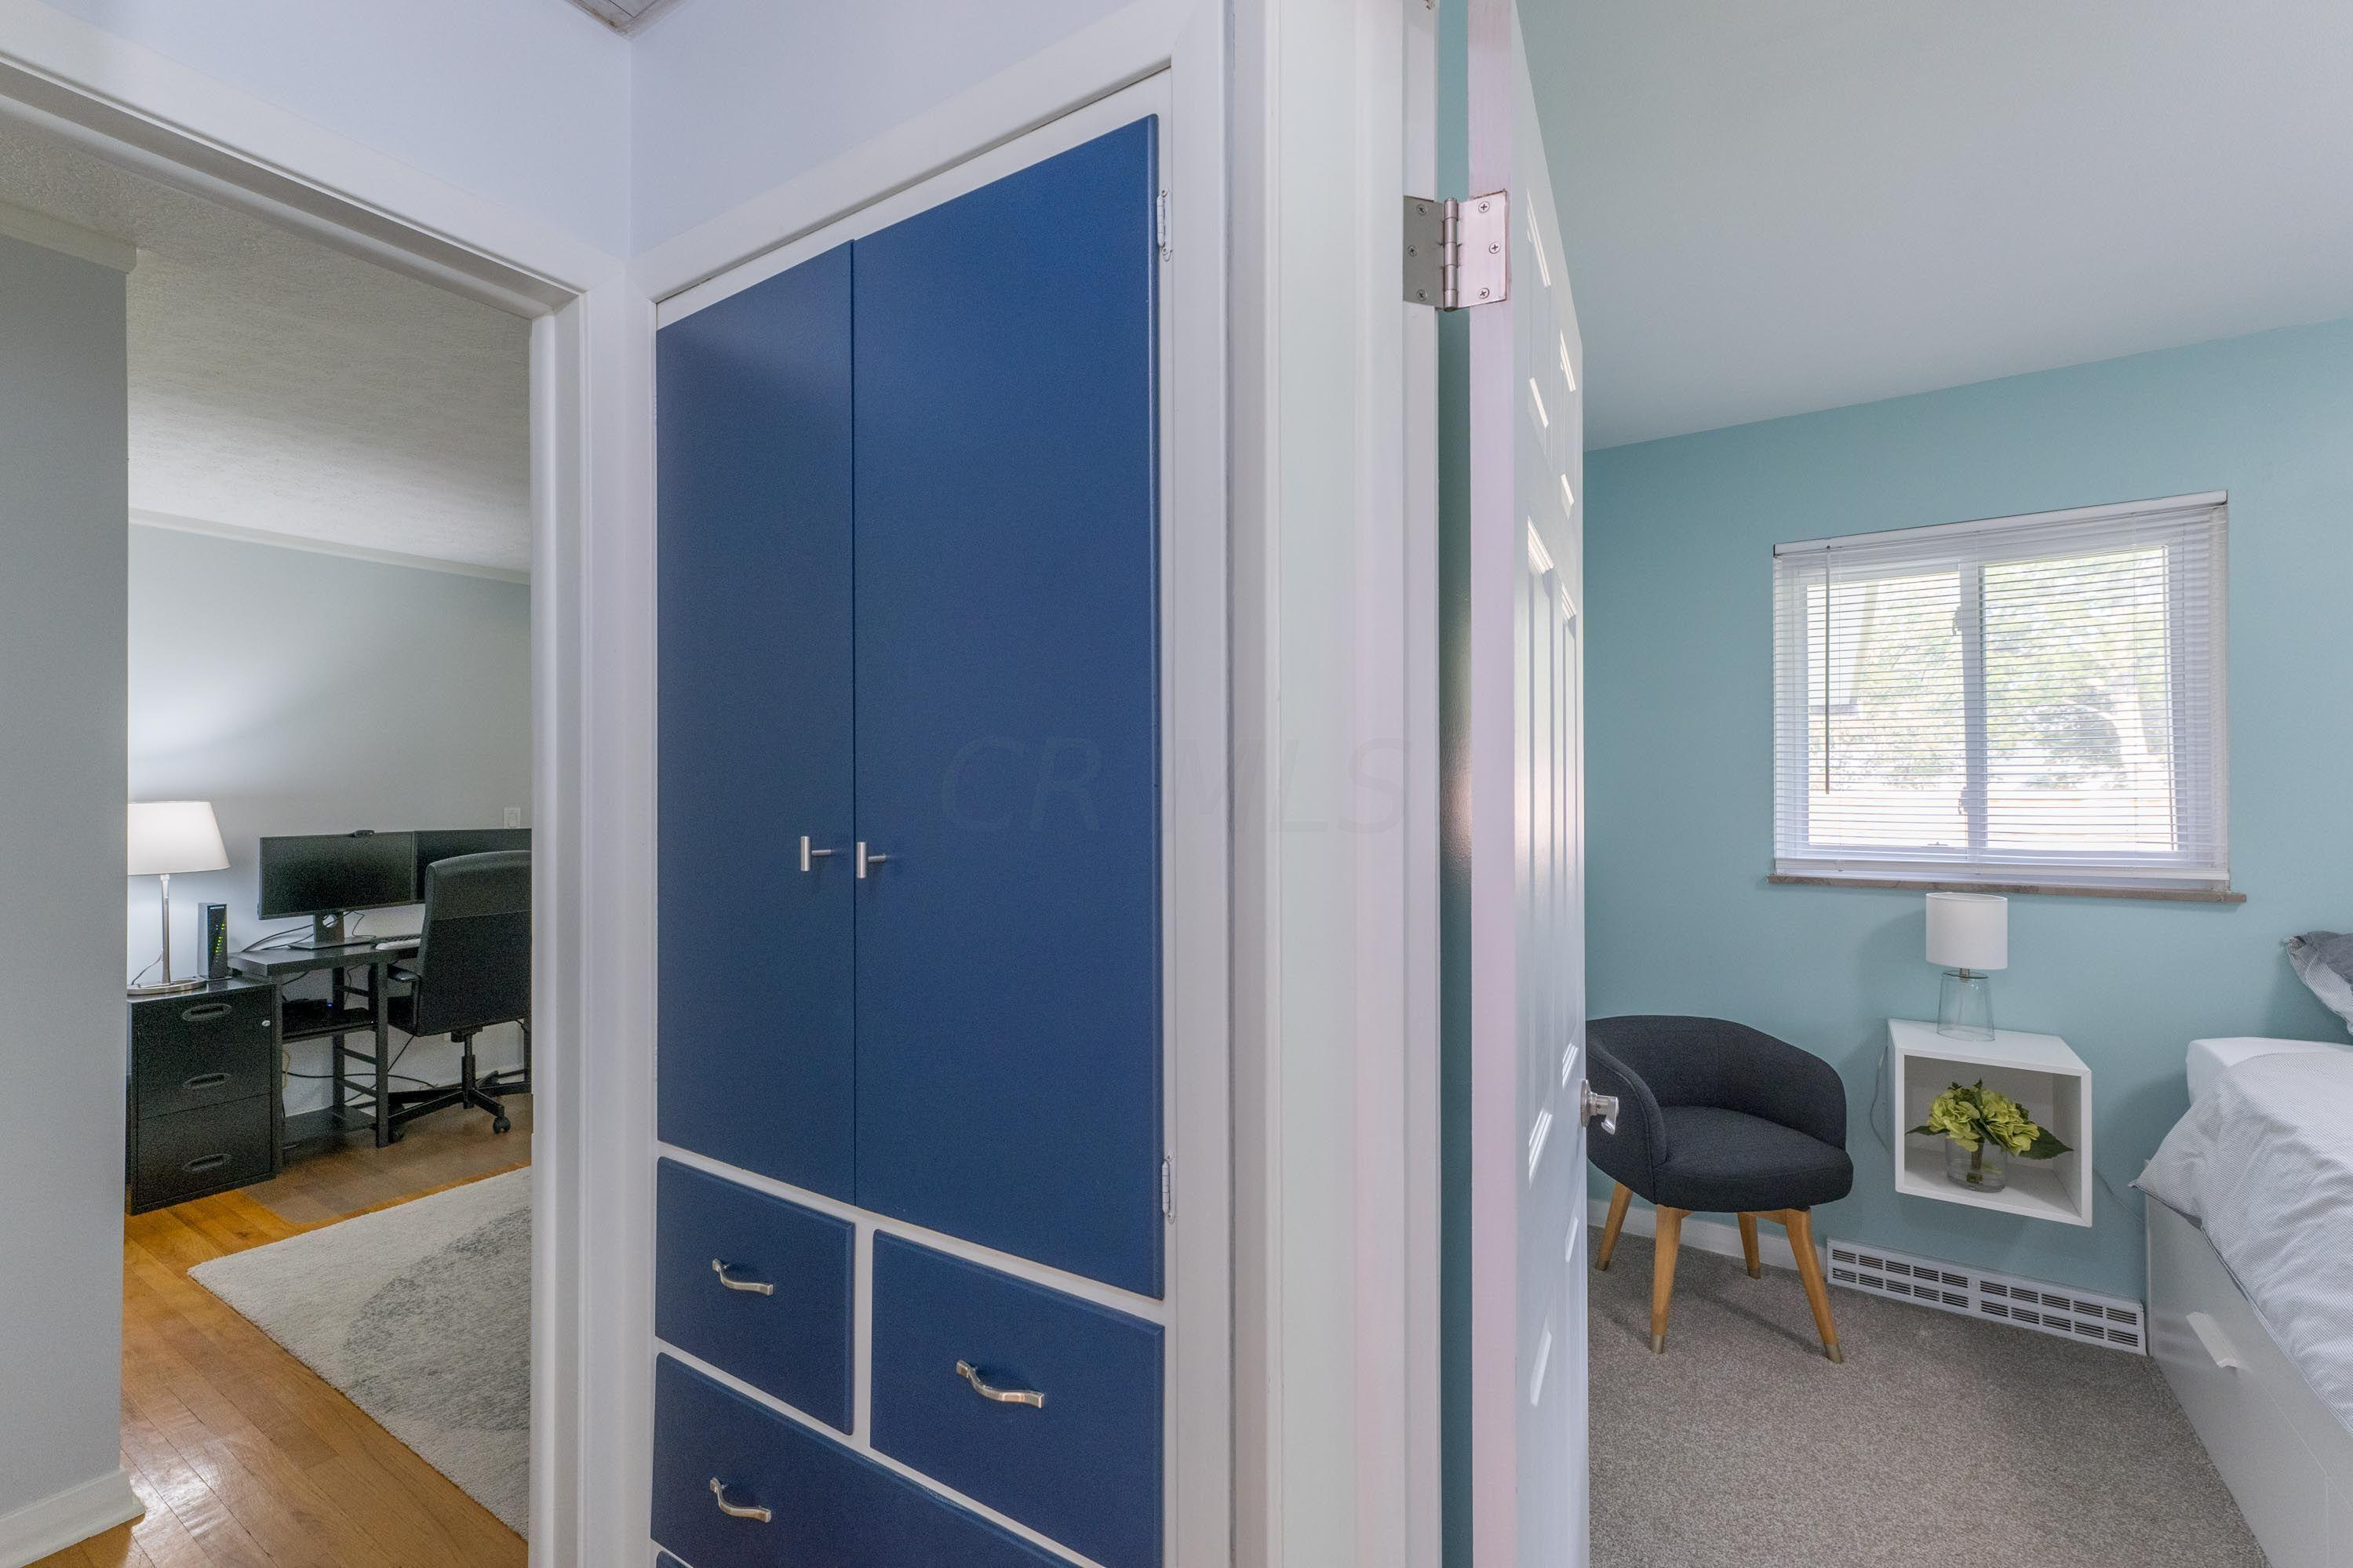 Hall linen closet built-in